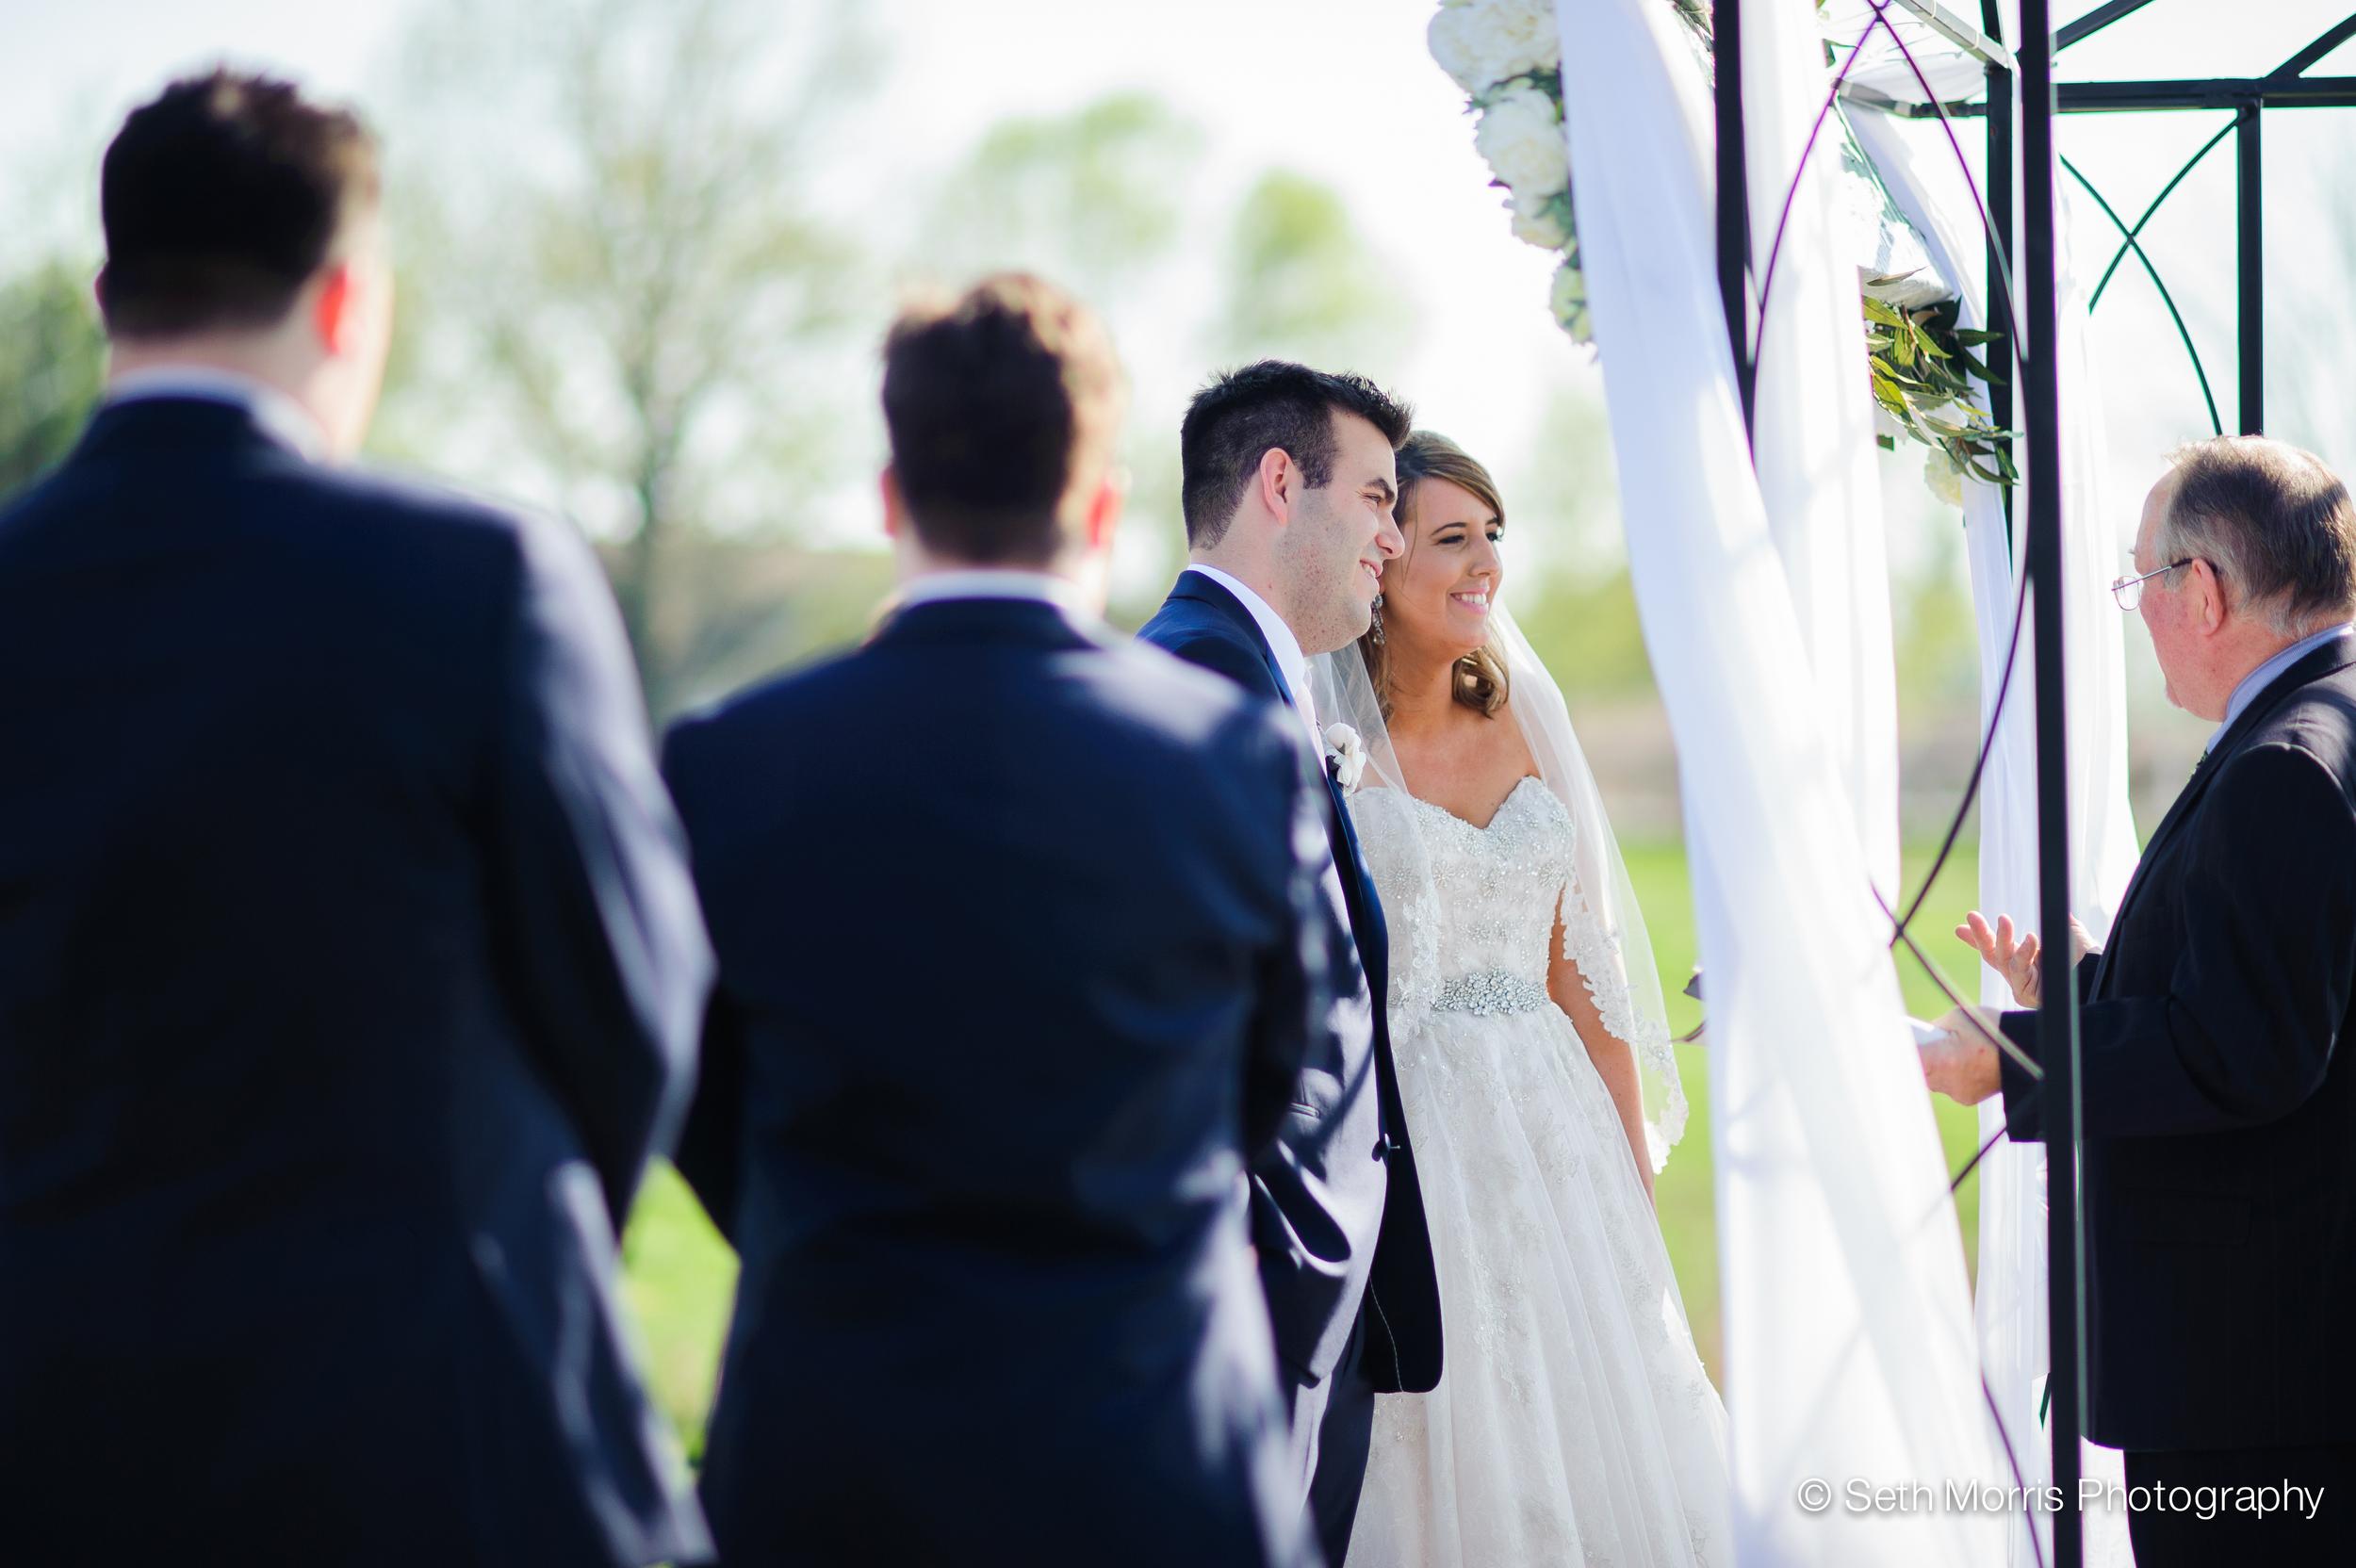 metamora-fields-wedding-photographer-peoria-167.jpg